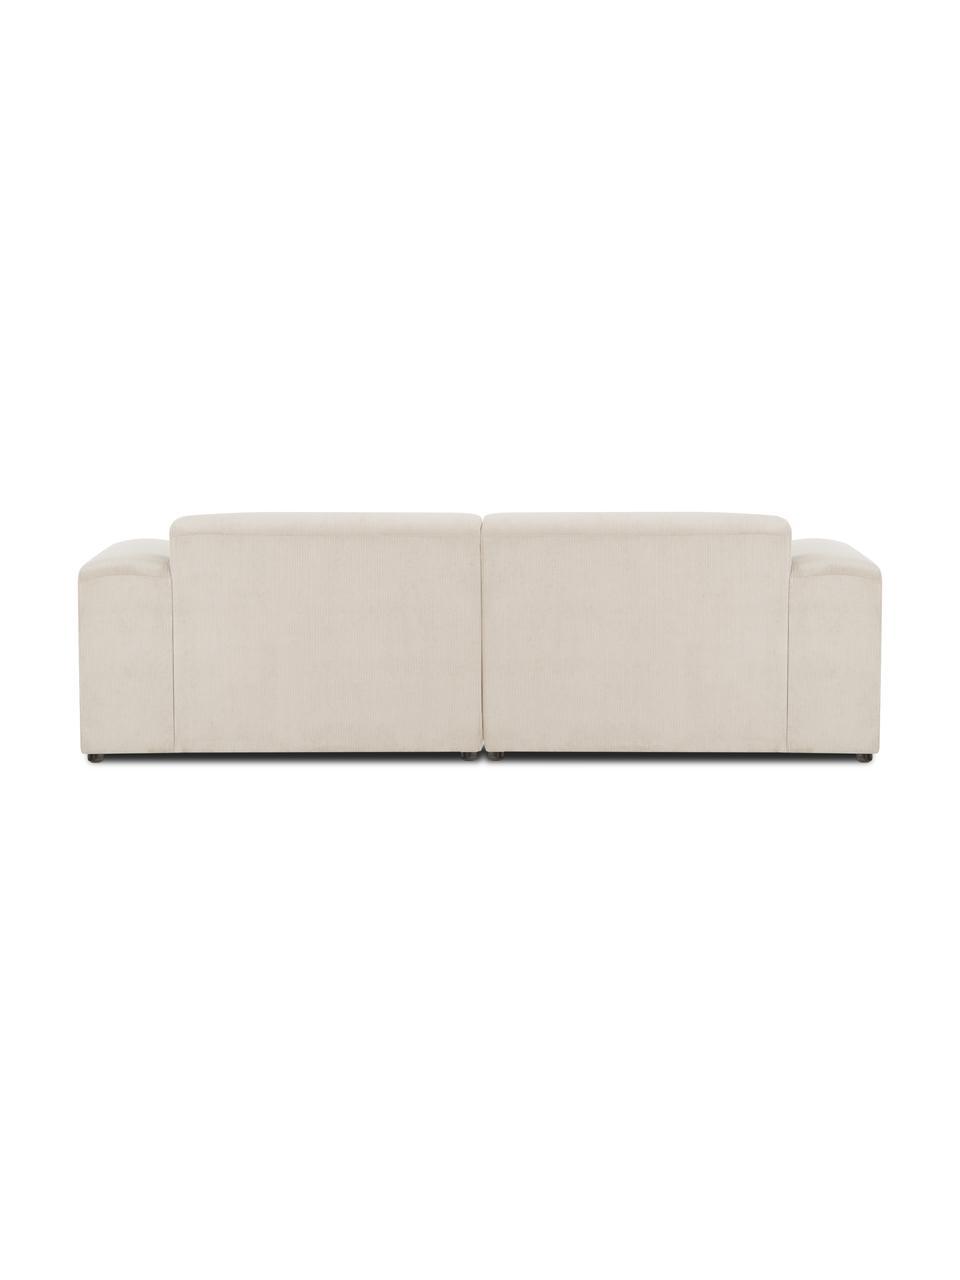 Ribfluwelen bank Melva (3-zits) in beige, Bekleding: corduroy (92% polyester, , Frame: massief grenenhout, FSC-g, Poten: kunststof, Corduroy beige, 238 x 101 cm